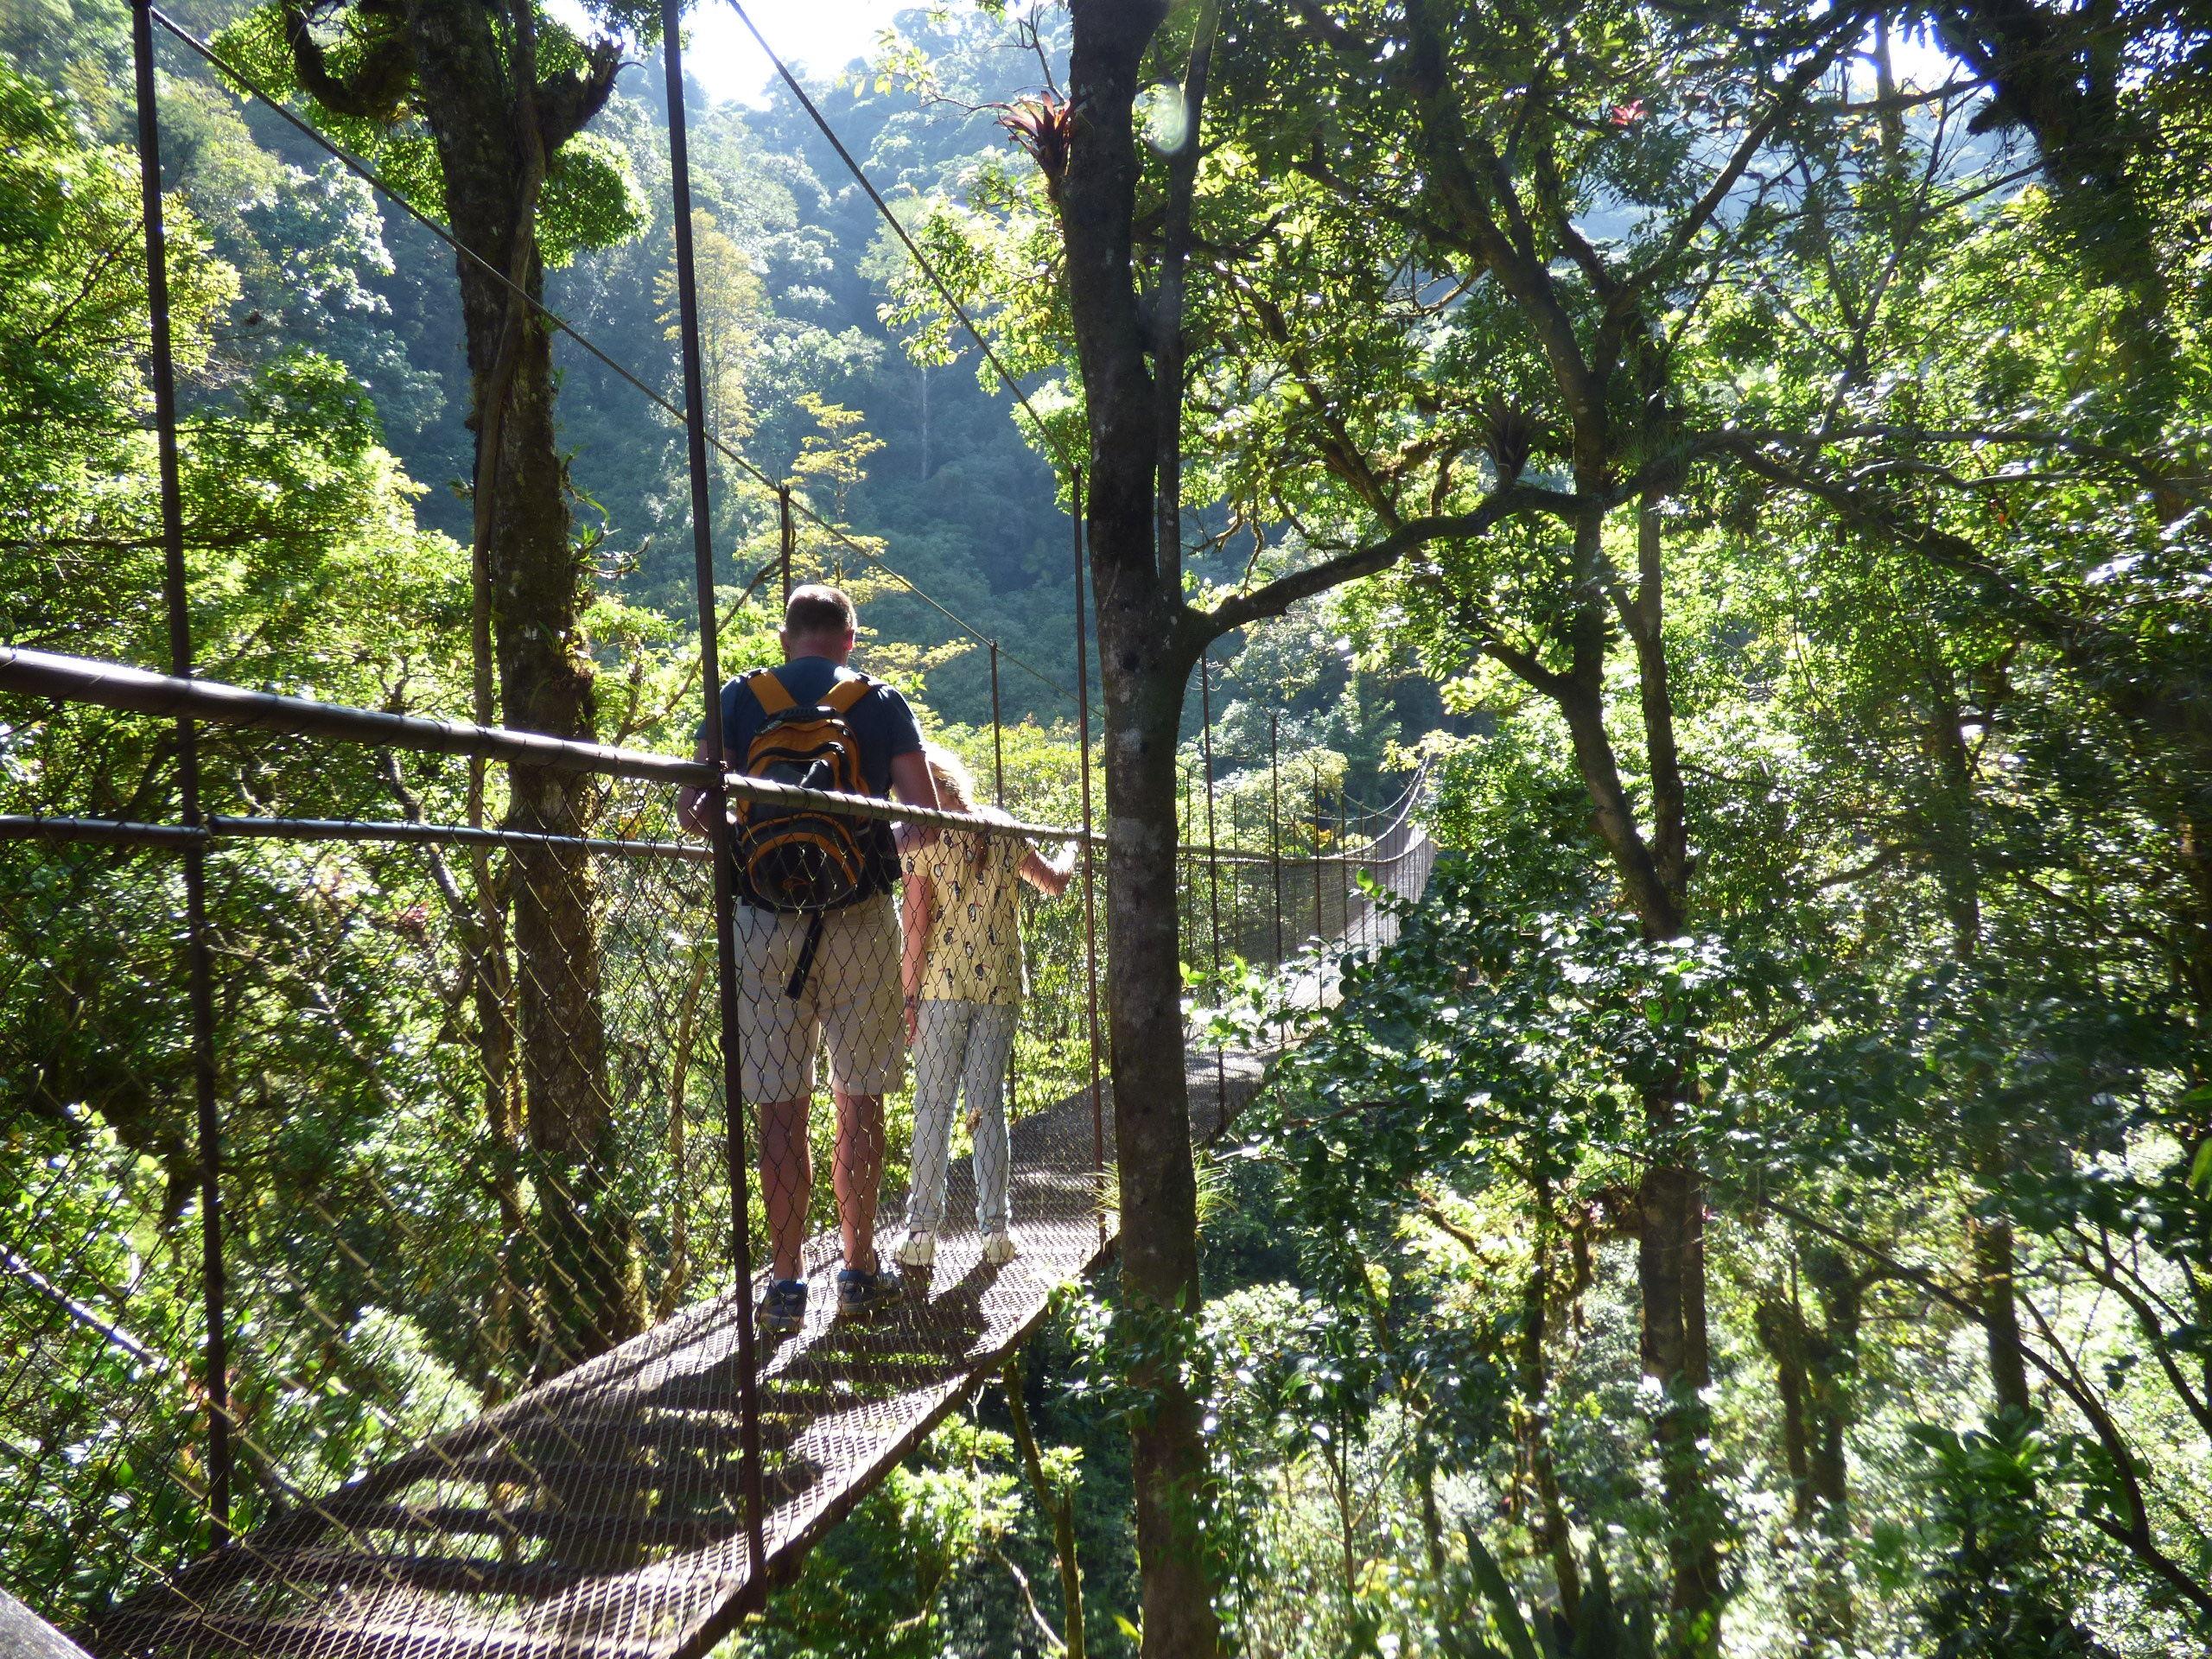 Sfeerimpressie Rondreis Panama: Gezinsreis Panama